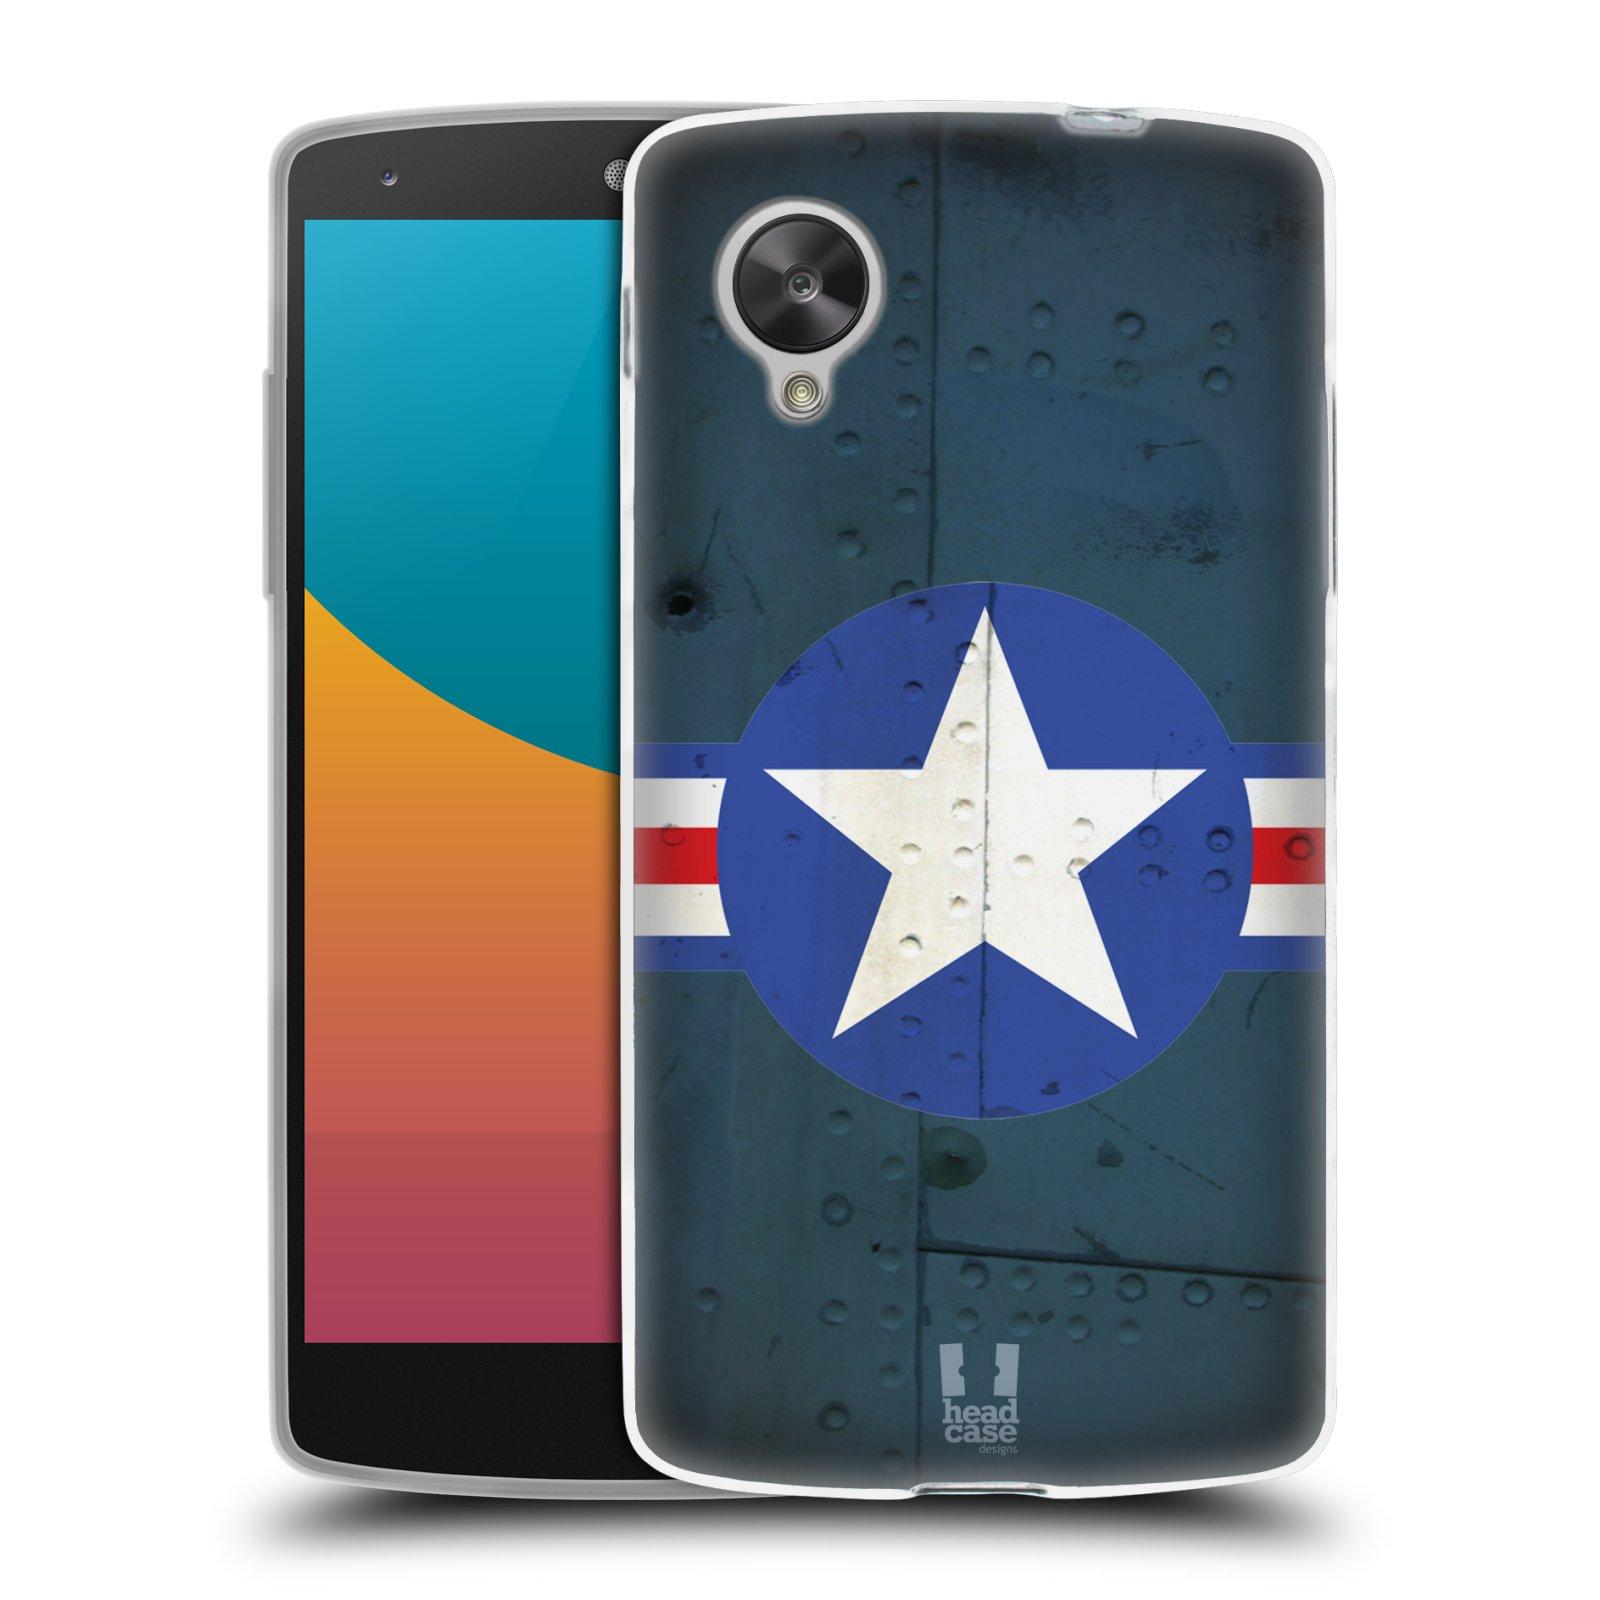 Silikonové pouzdro na mobil LG Nexus 5 HEAD CASE POSTWAR (Silikonový kryt či obal na mobilní telefon LG Google Nexus 5 D821)